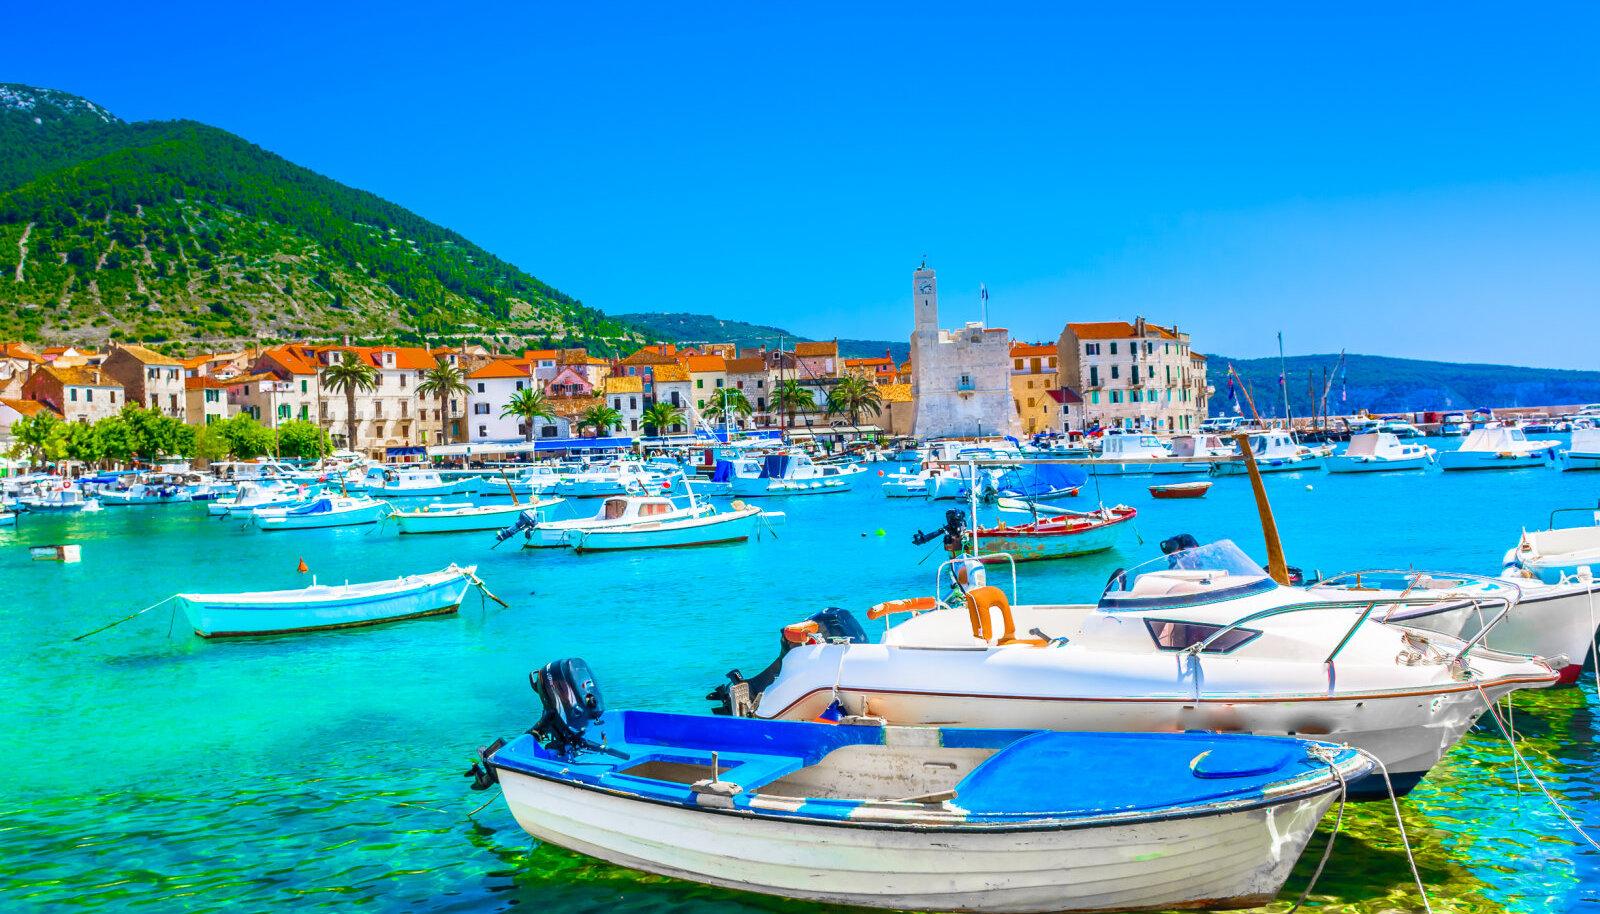 Komiza, Horvaatia